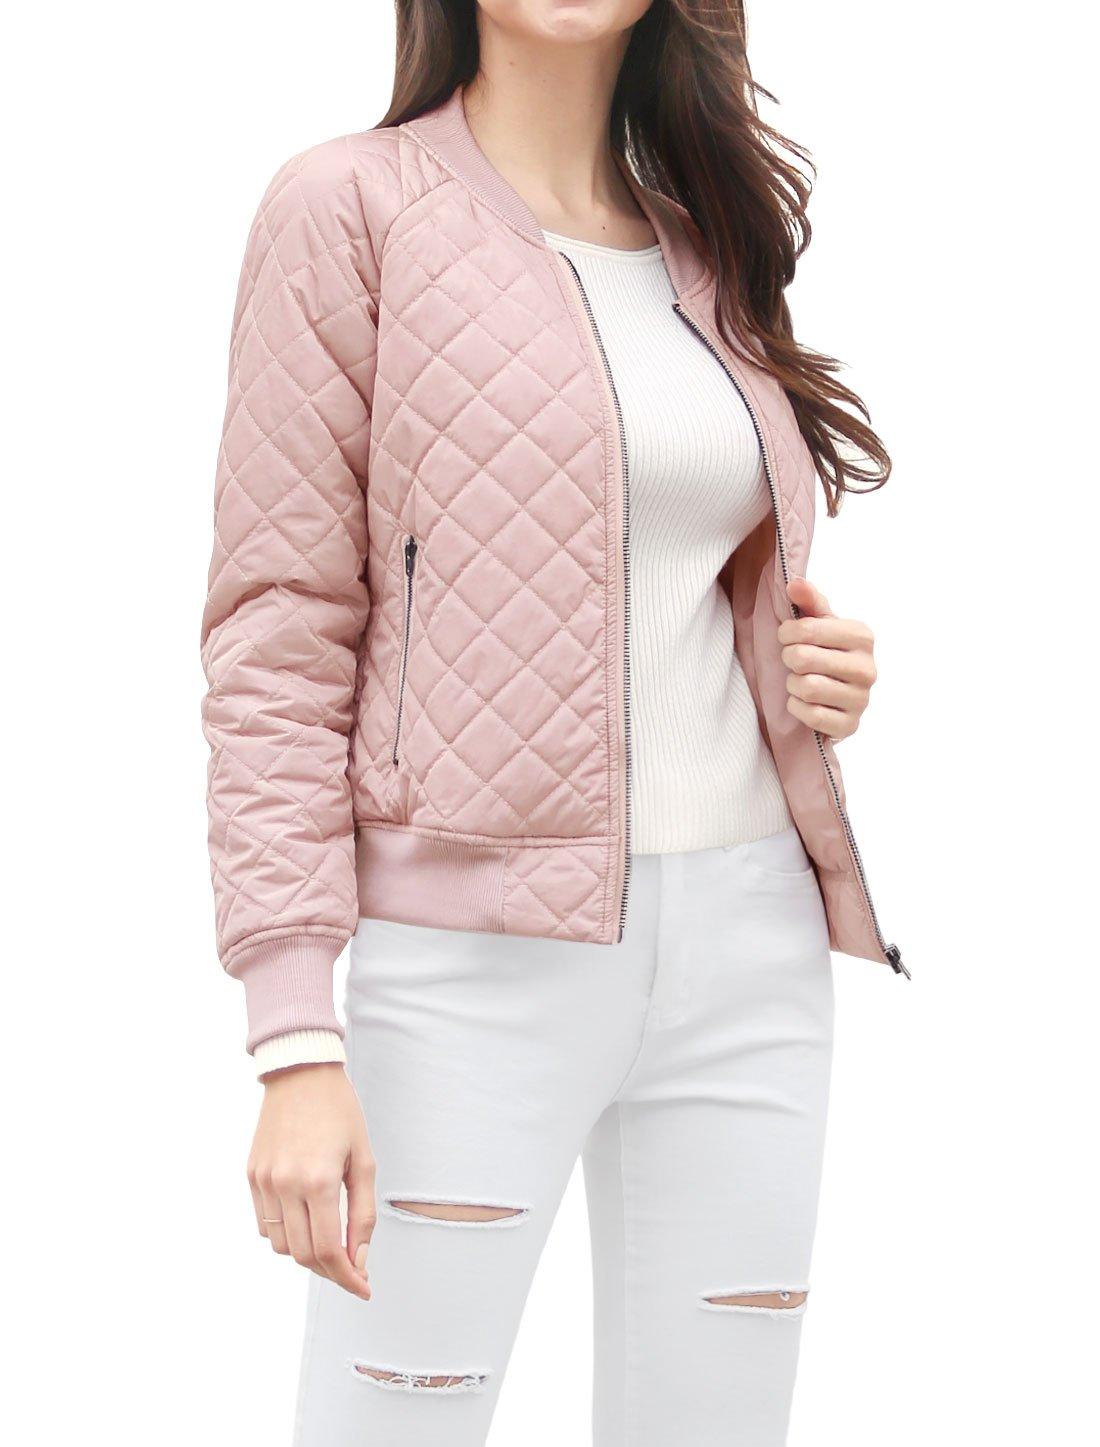 Allegra K Women's Raglan Long Sleeves Quilted Zip Up Bomber Jacket Pink XS (US 2) by Allegra K